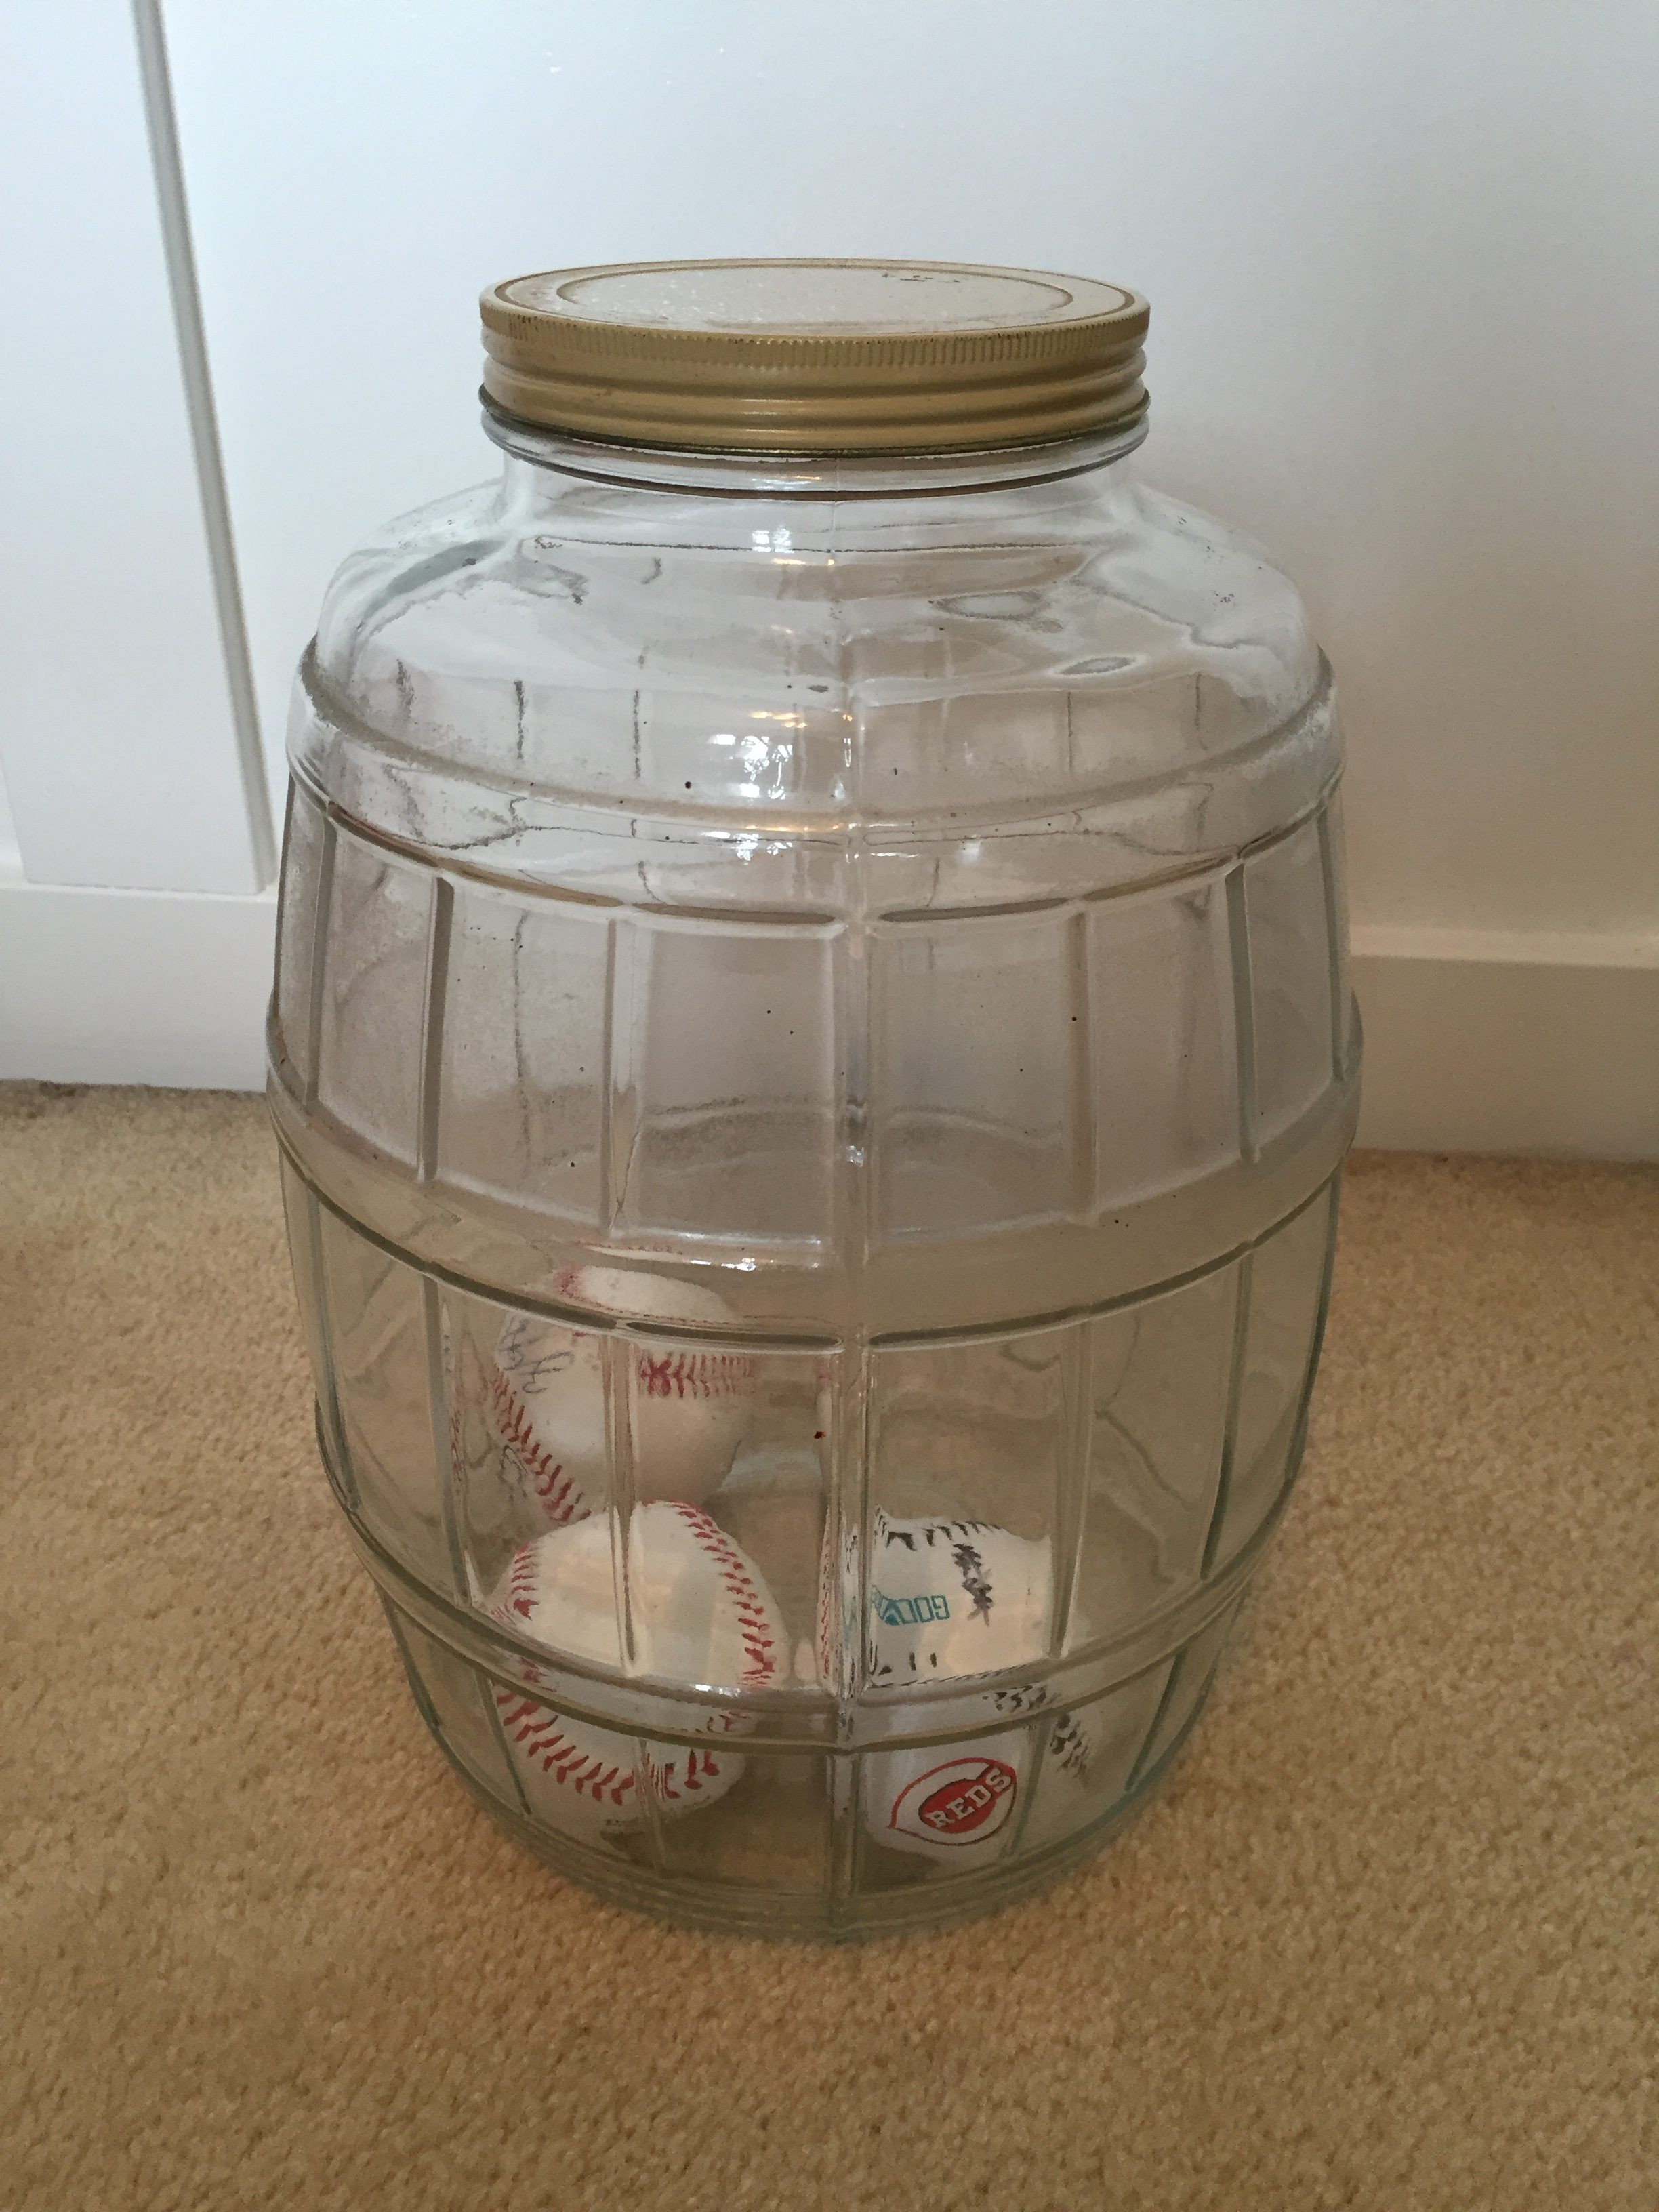 Large Antique Jar for housing Baseballs by www.whitecottagehomeandliving.com